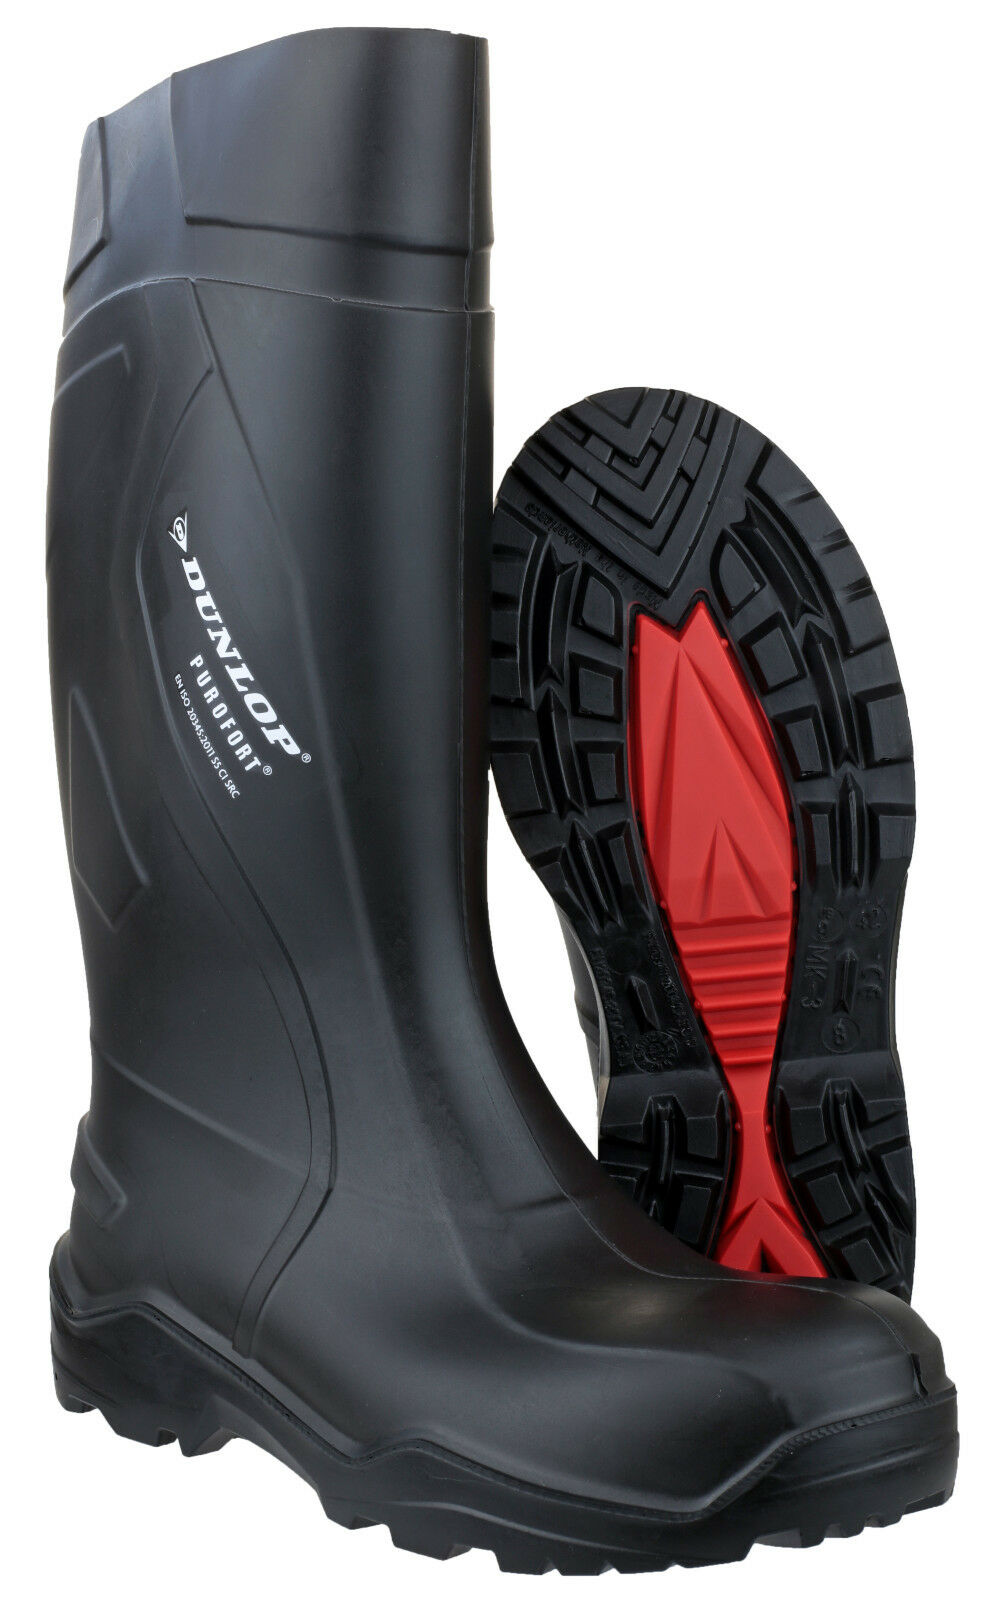 Dunlop Purofort+ Safety Waterproof Mens Work Pull On Wellingtons Boots UK6-14